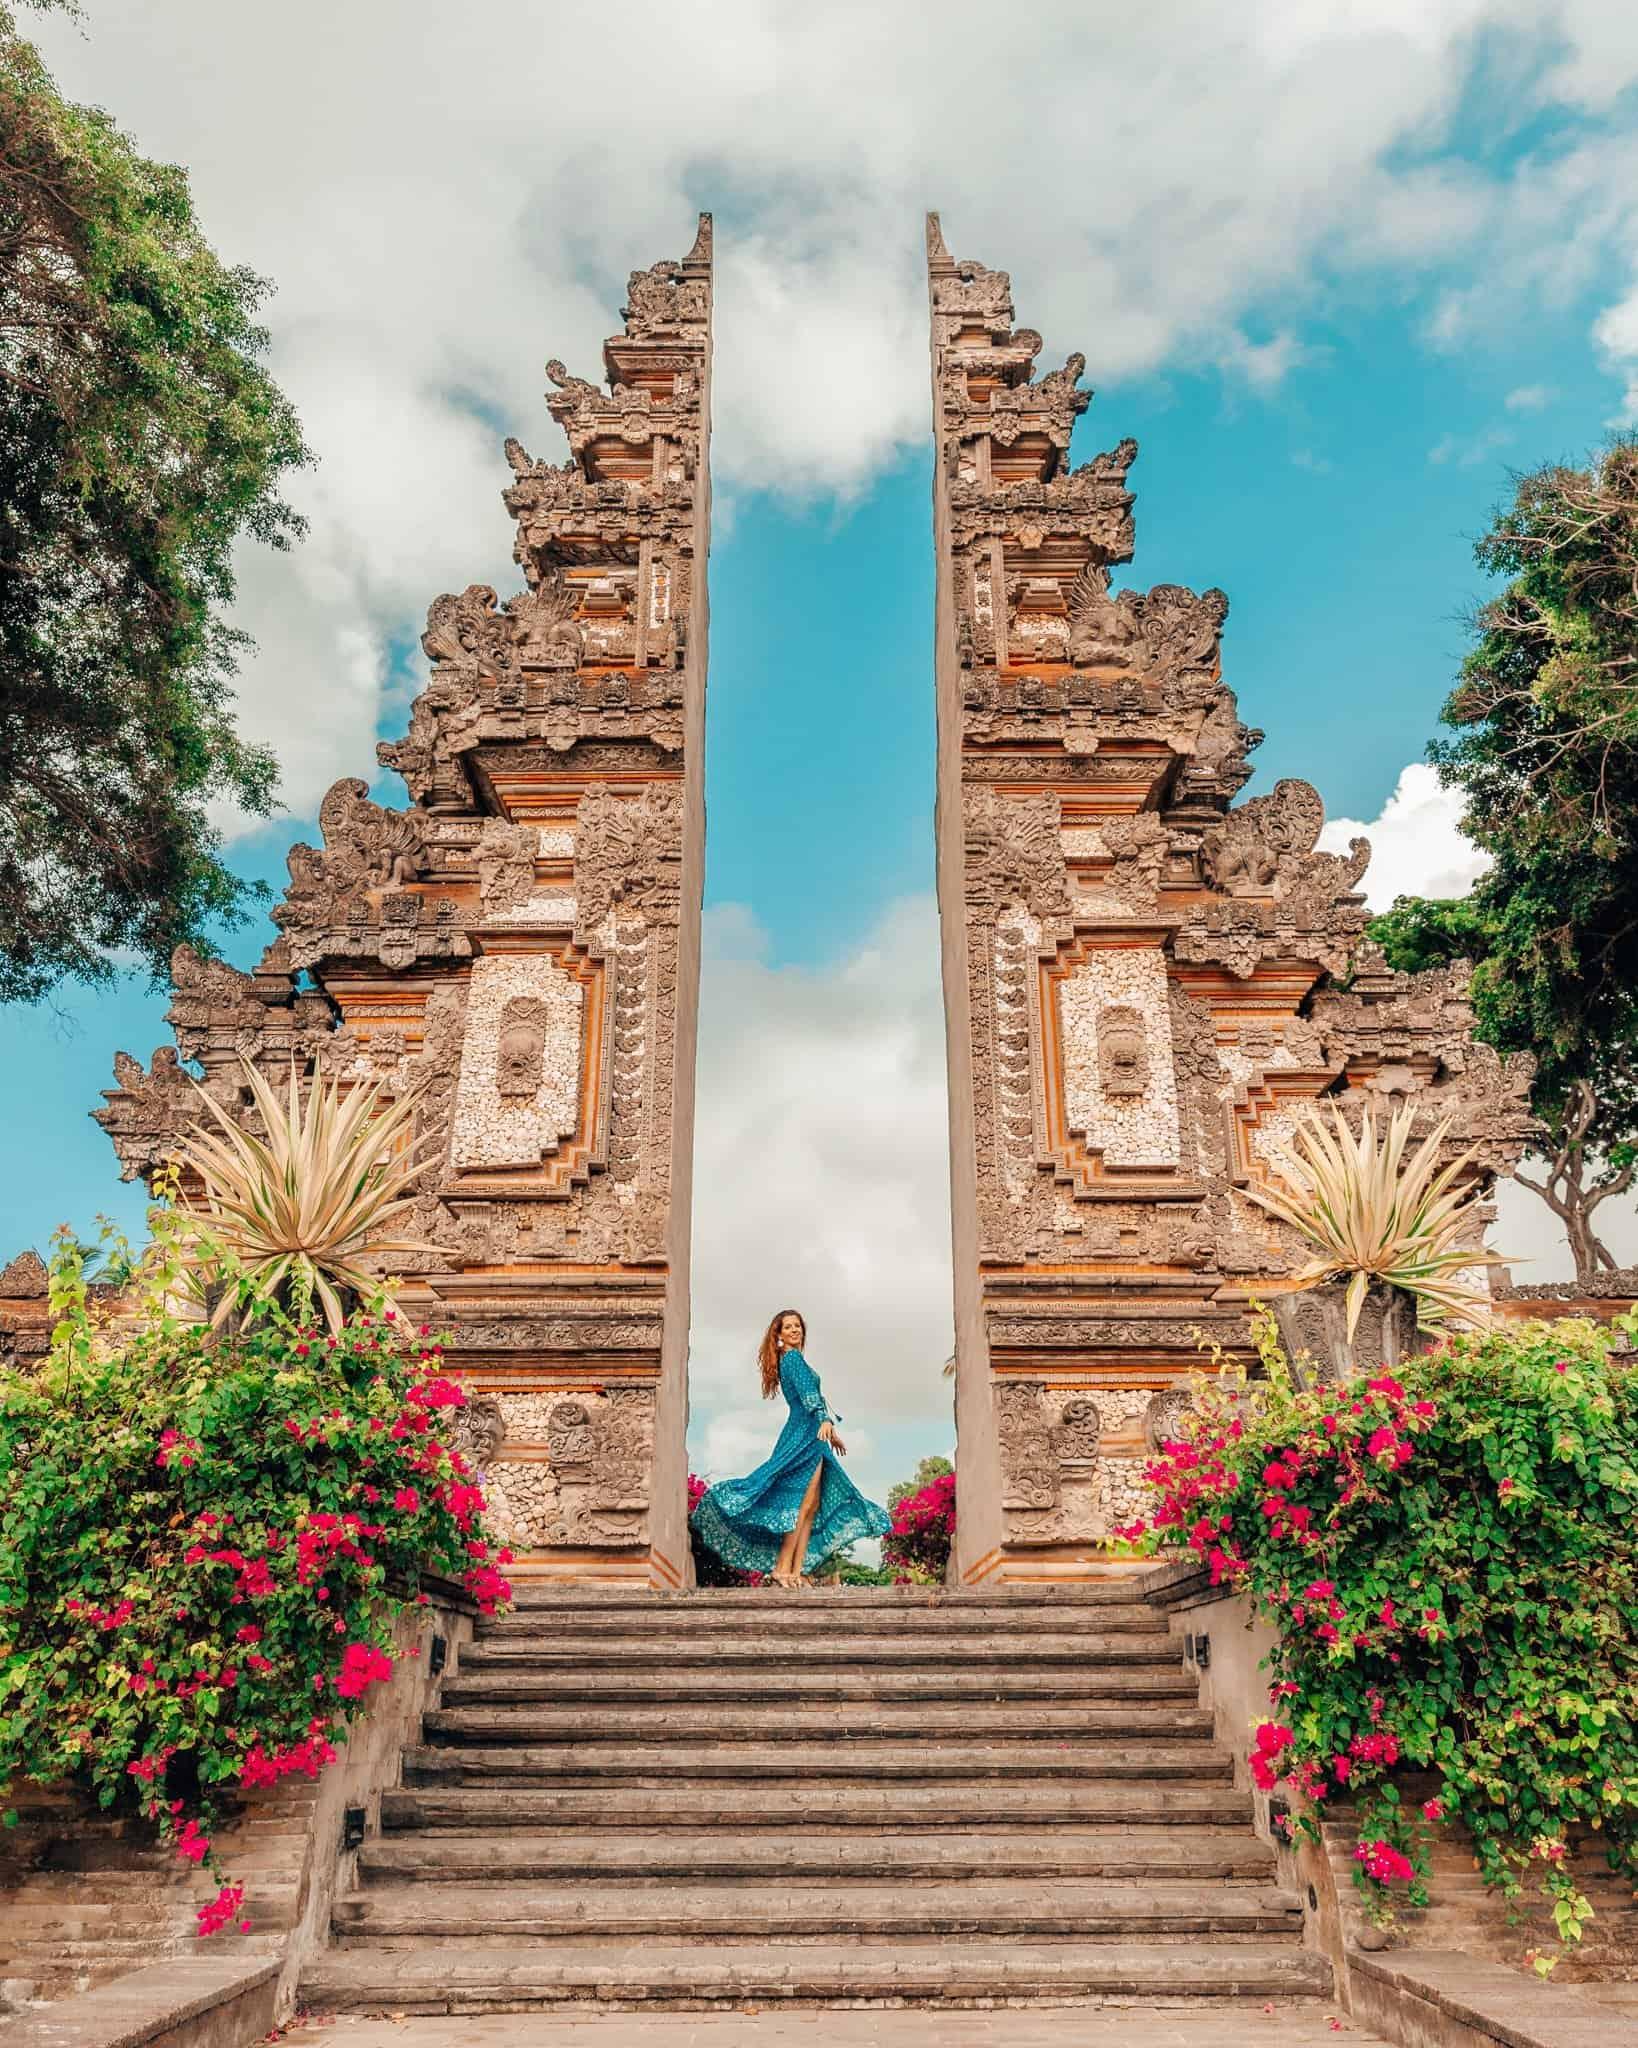 Bali Gate Nusa Dua Beach Resort and Spa - The Next Trip